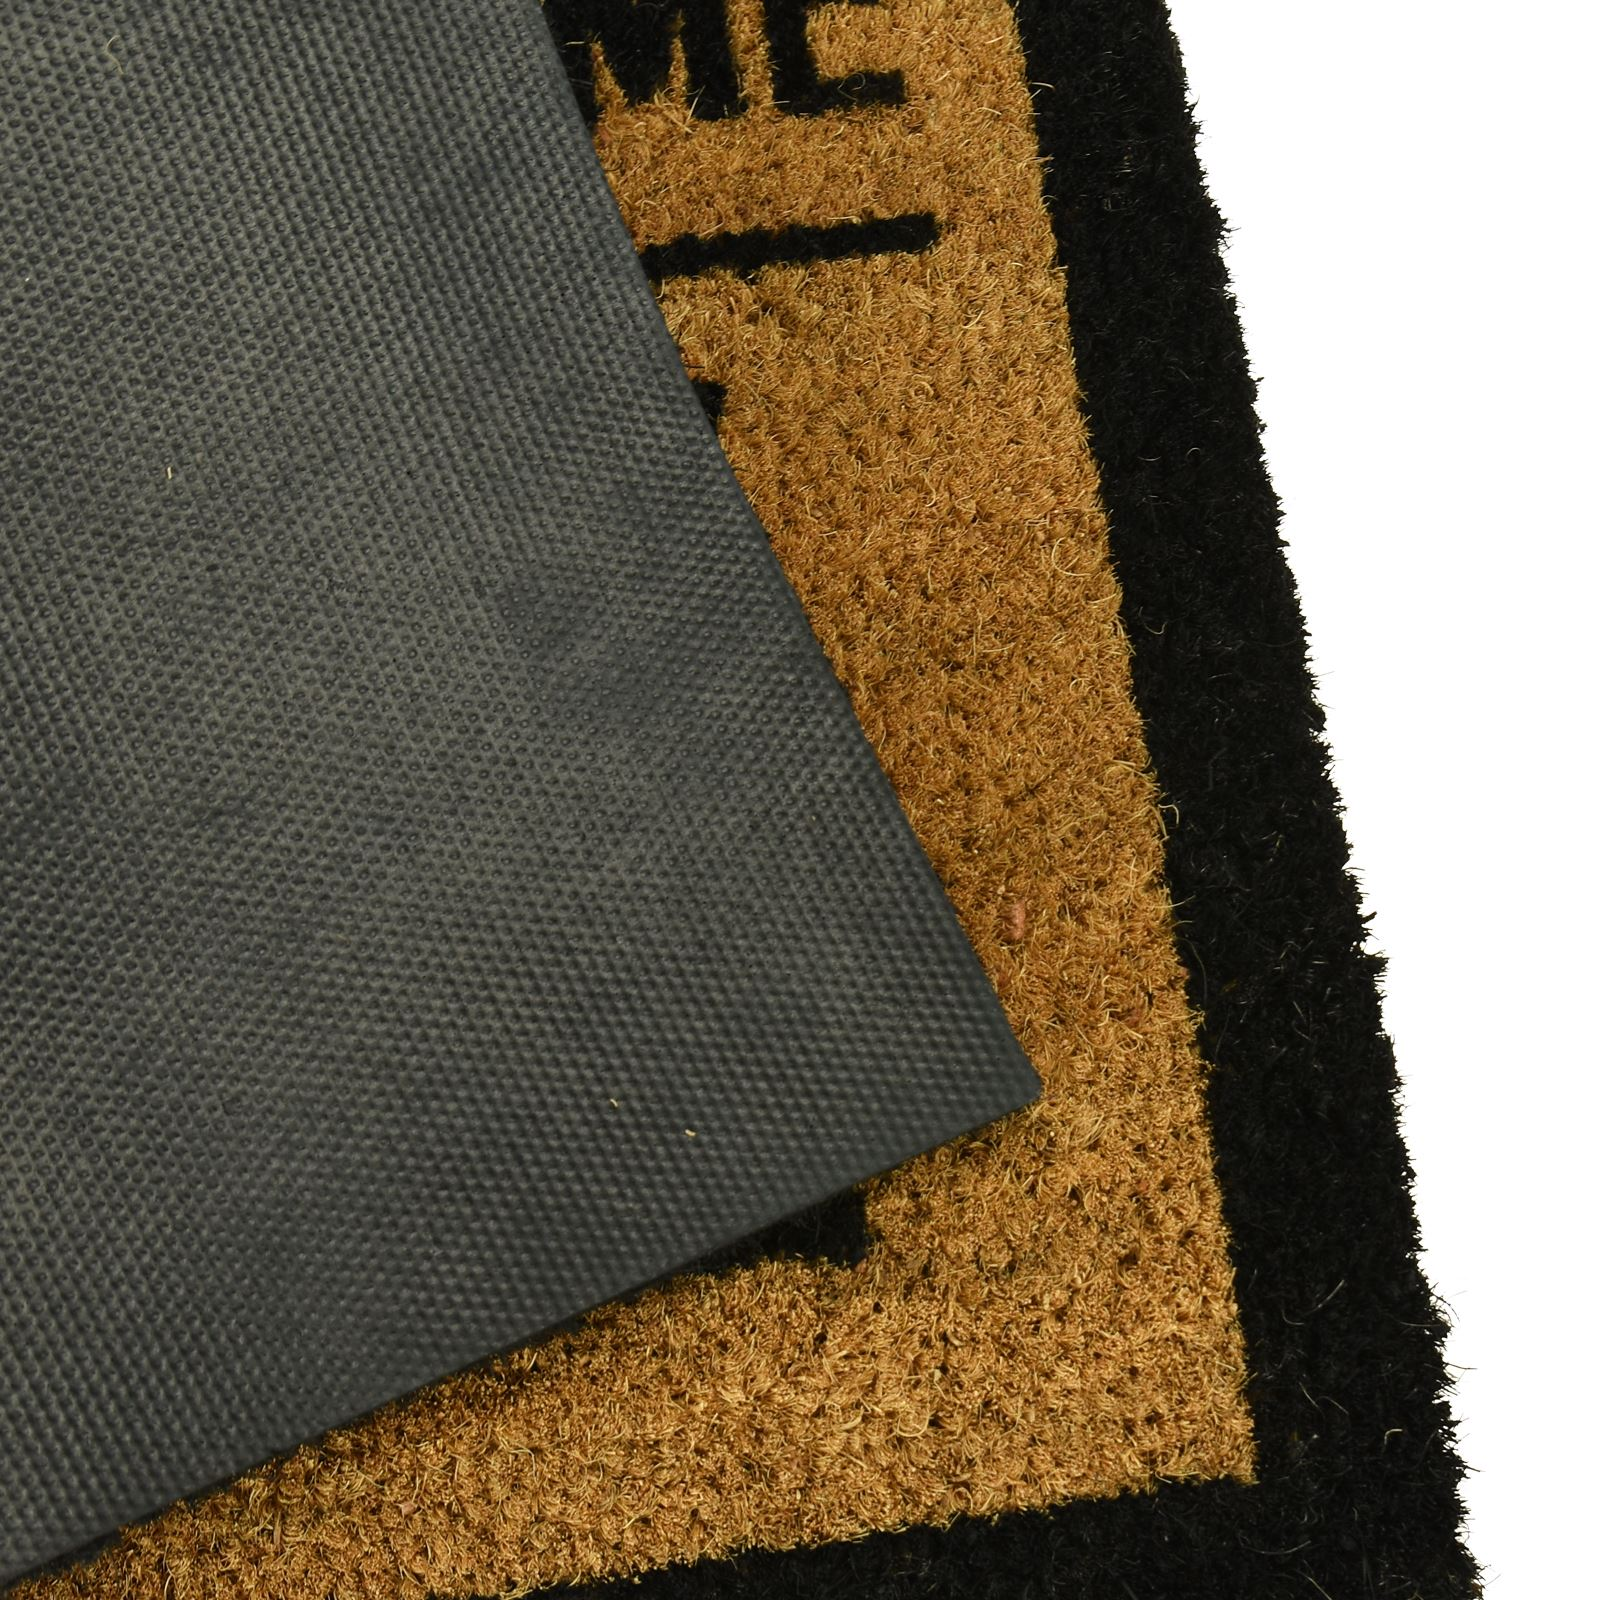 Plain-Non-Slip-Door-Mat-Tough-Natural-Coir-PVC-Back-Welcome-Doormat-40-x-60cm miniatura 37